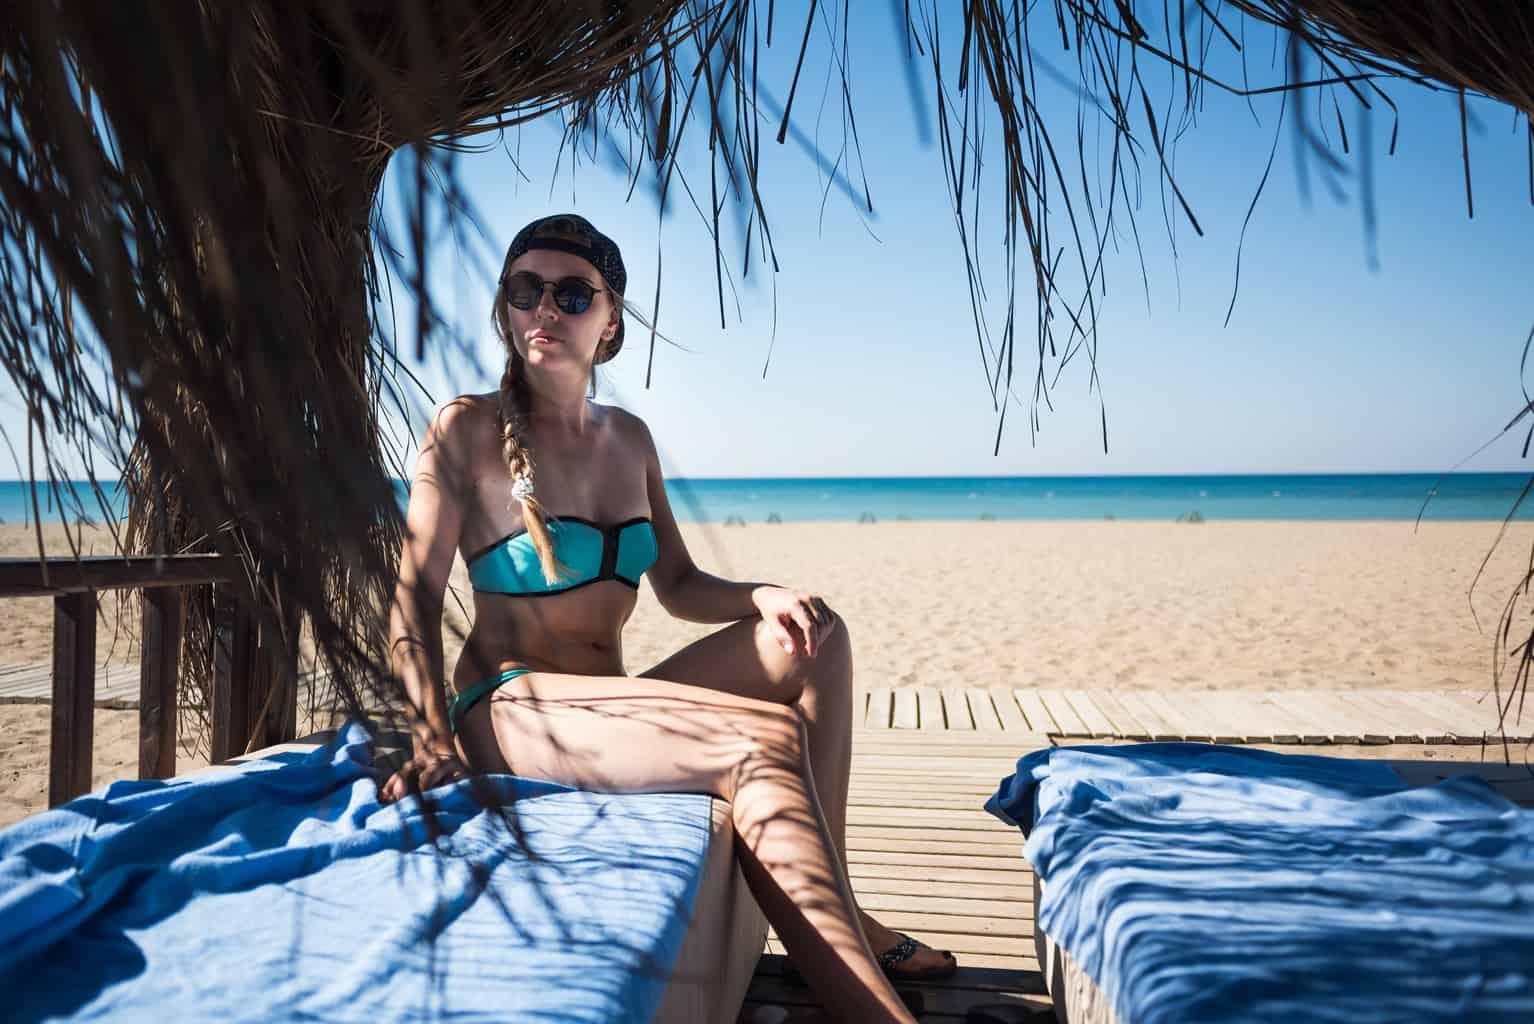 Belek, Türkei, Urlaub, FernwehElixir, Frau am Strand